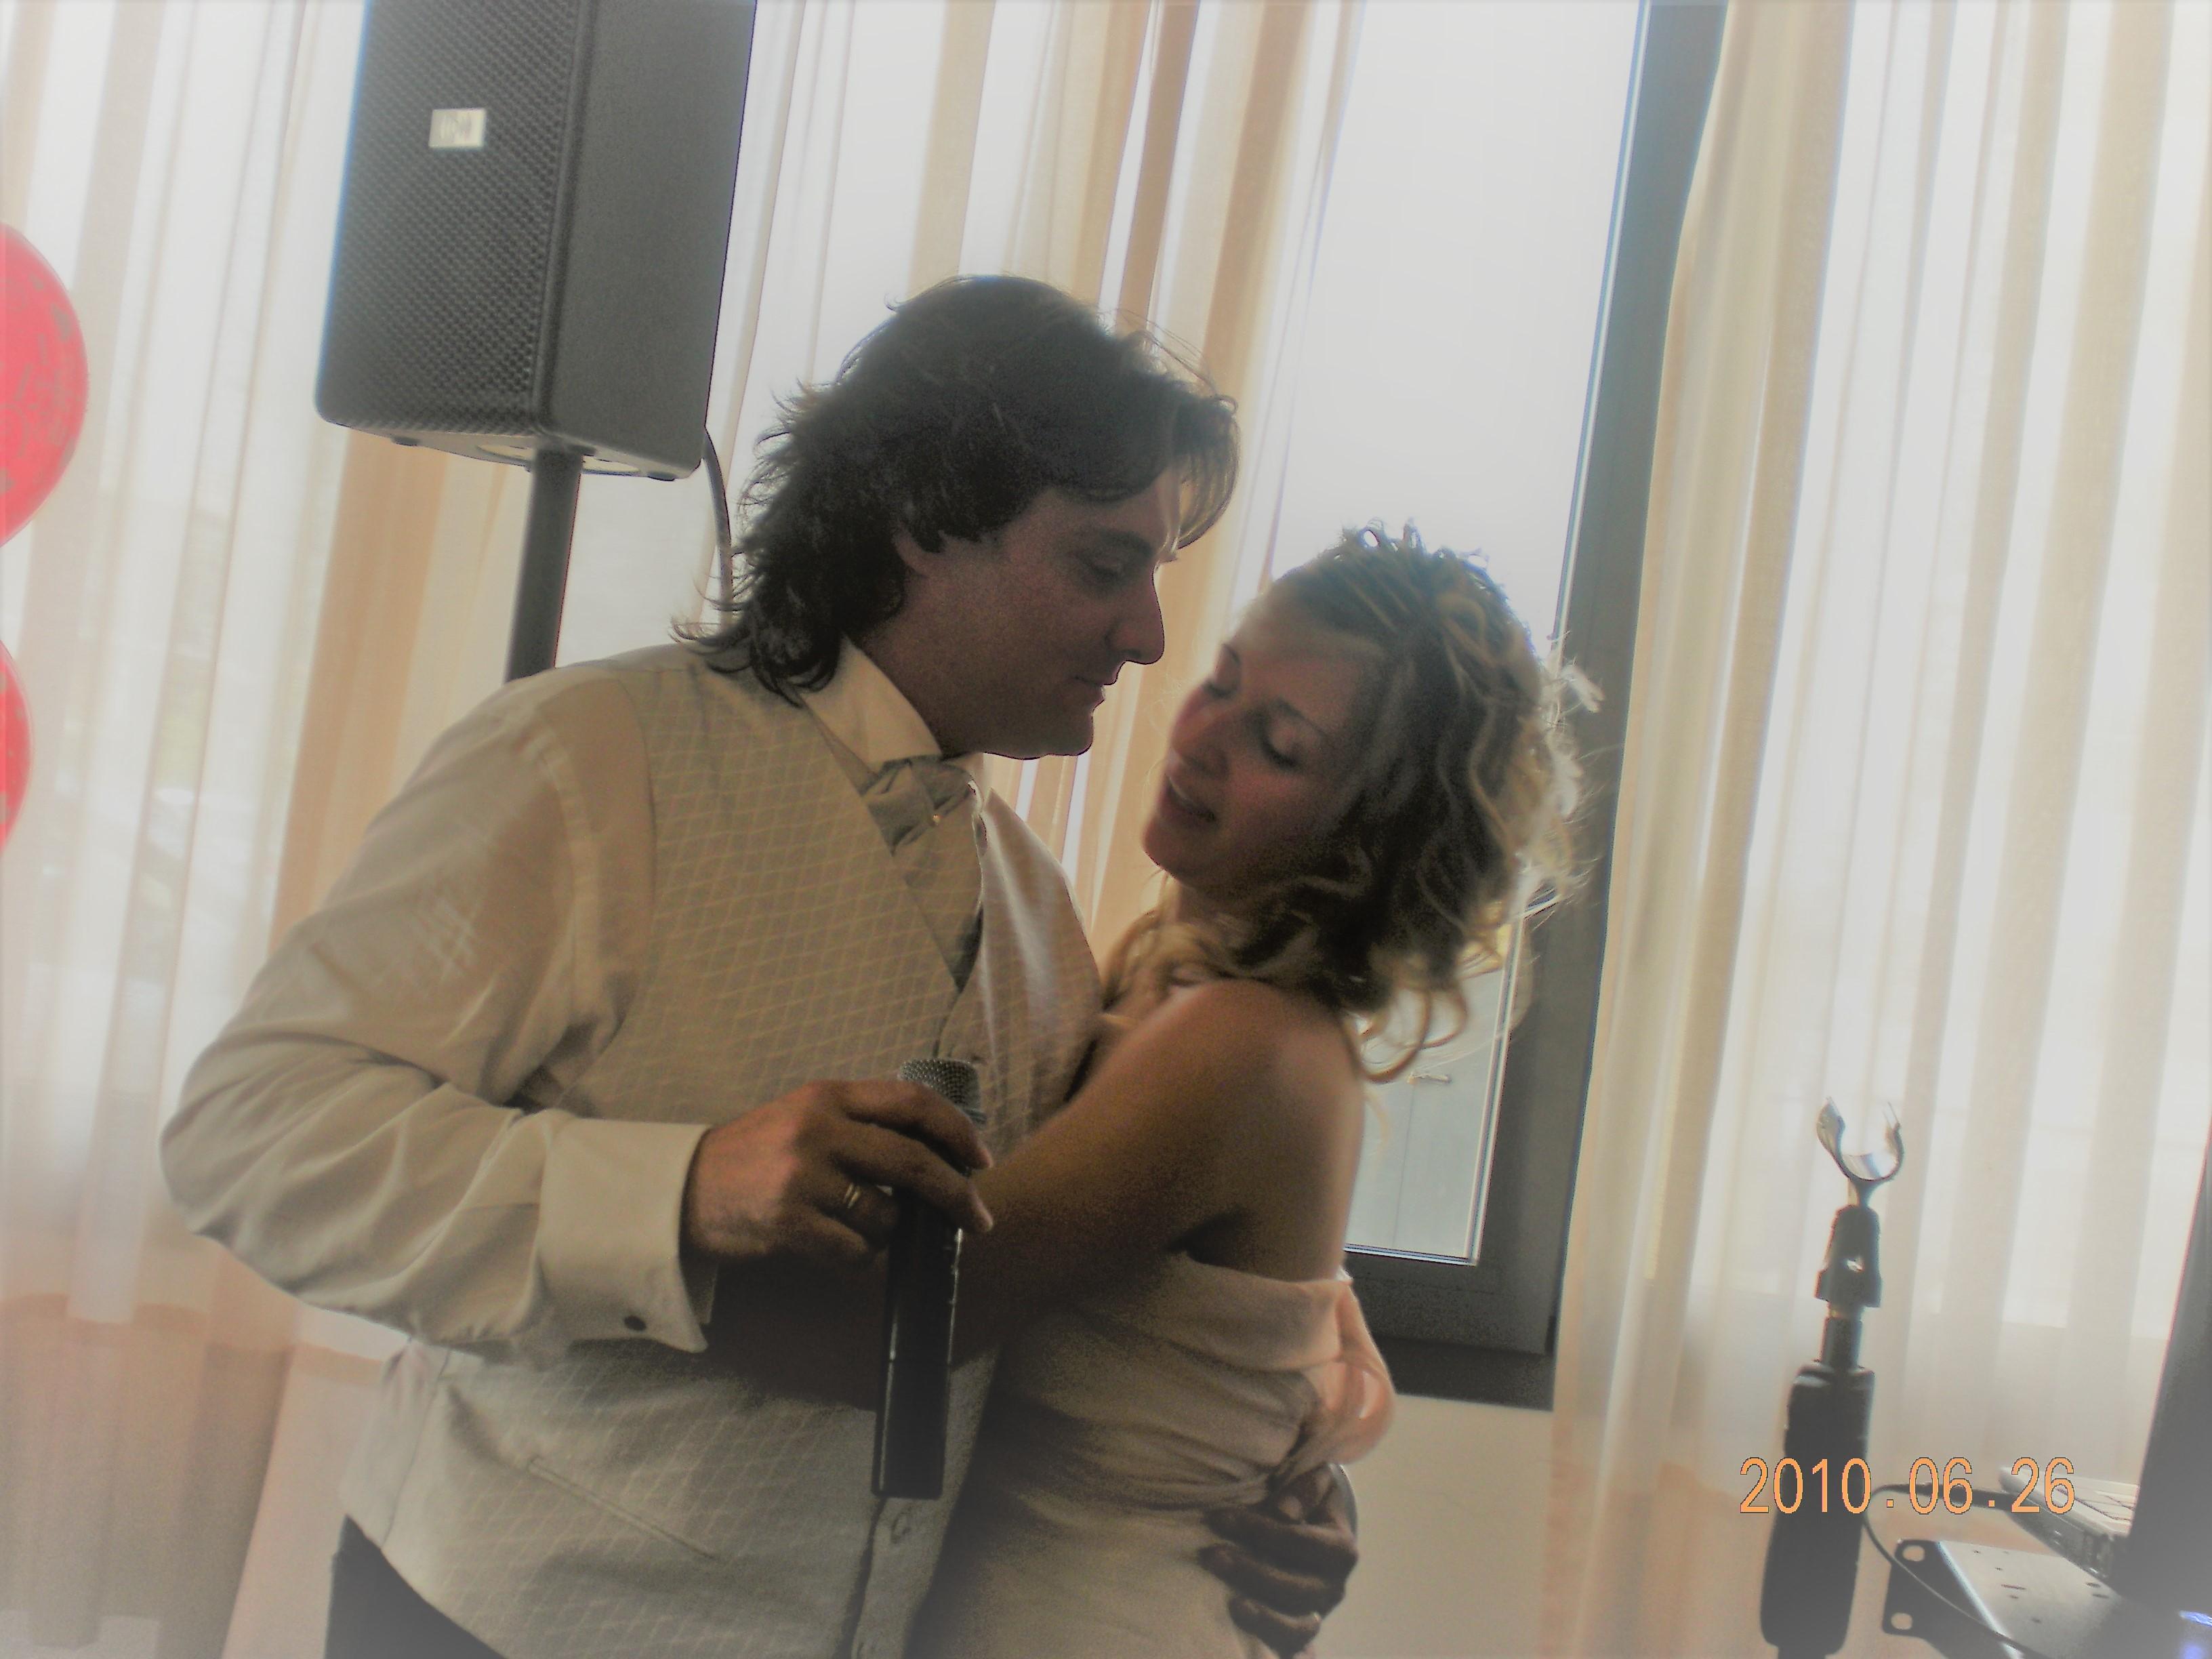 Francesco e Rosanna - 26.06.2010 - 036.JPG